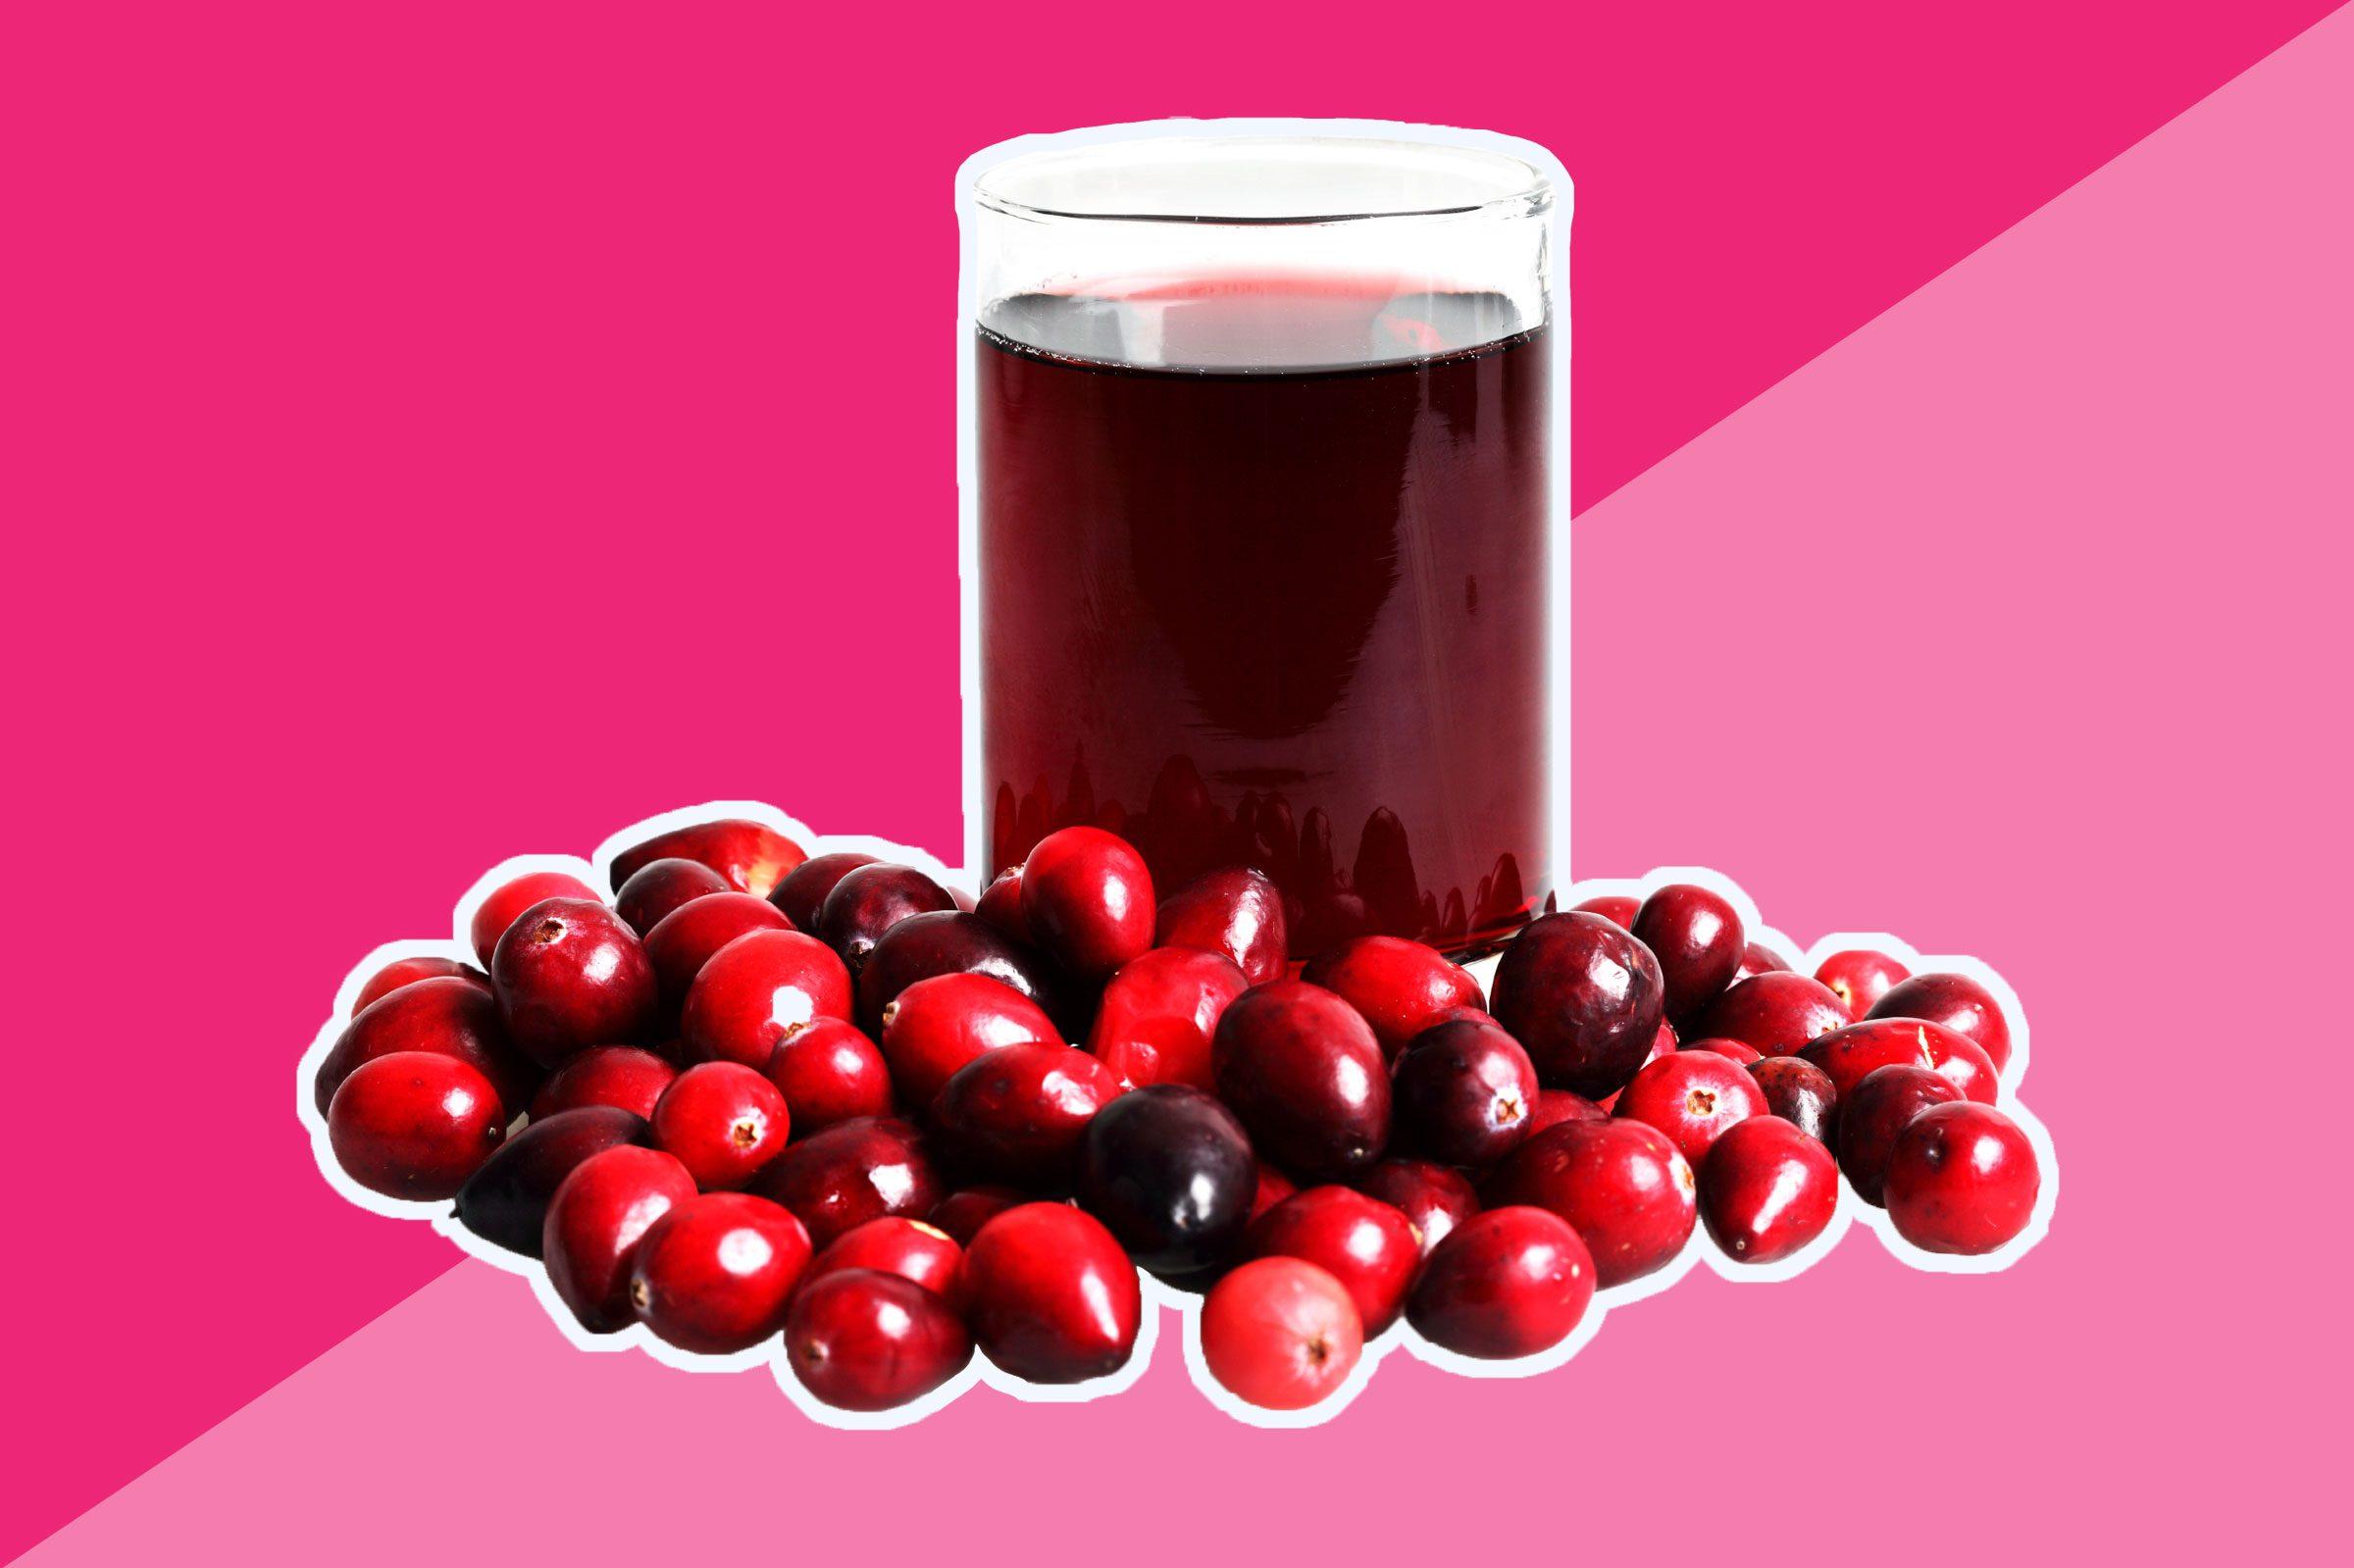 Natural Easter Egg Dye #5: Cranberry juice